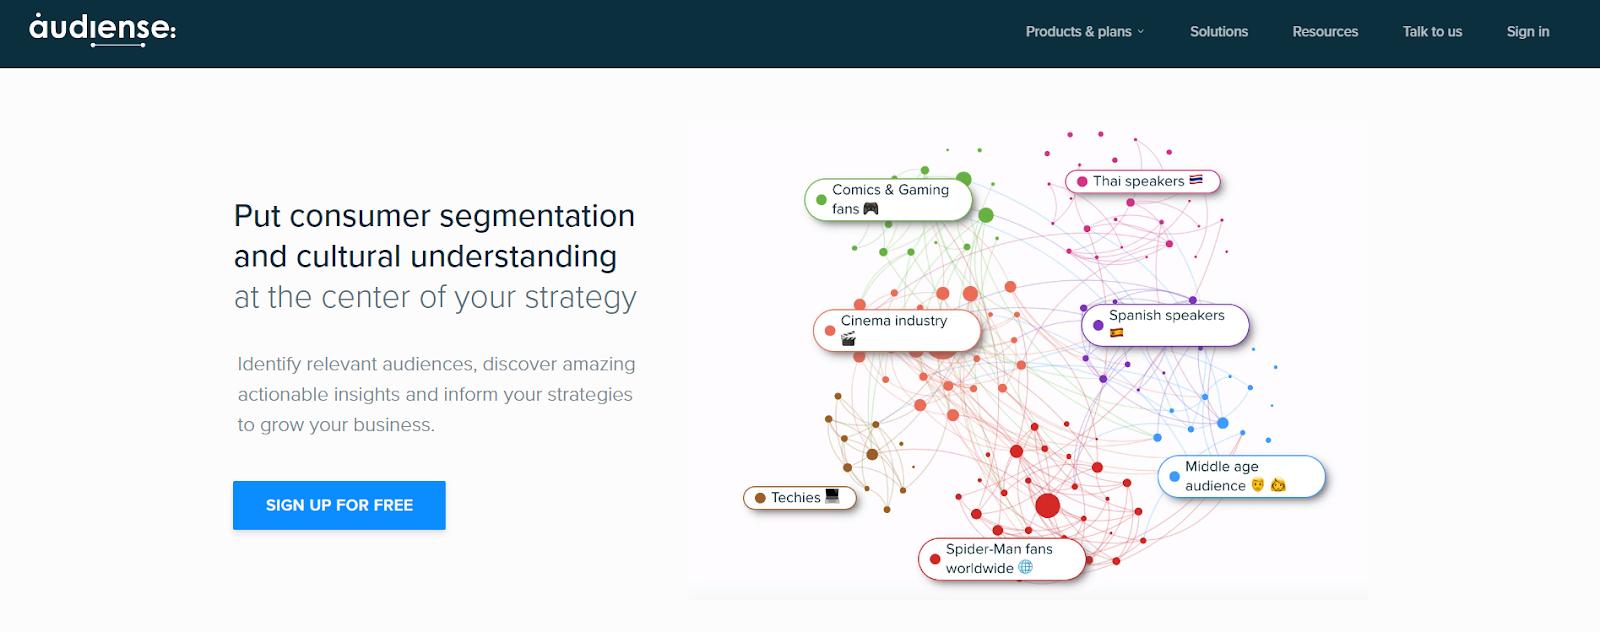 audience segmentation and analytics